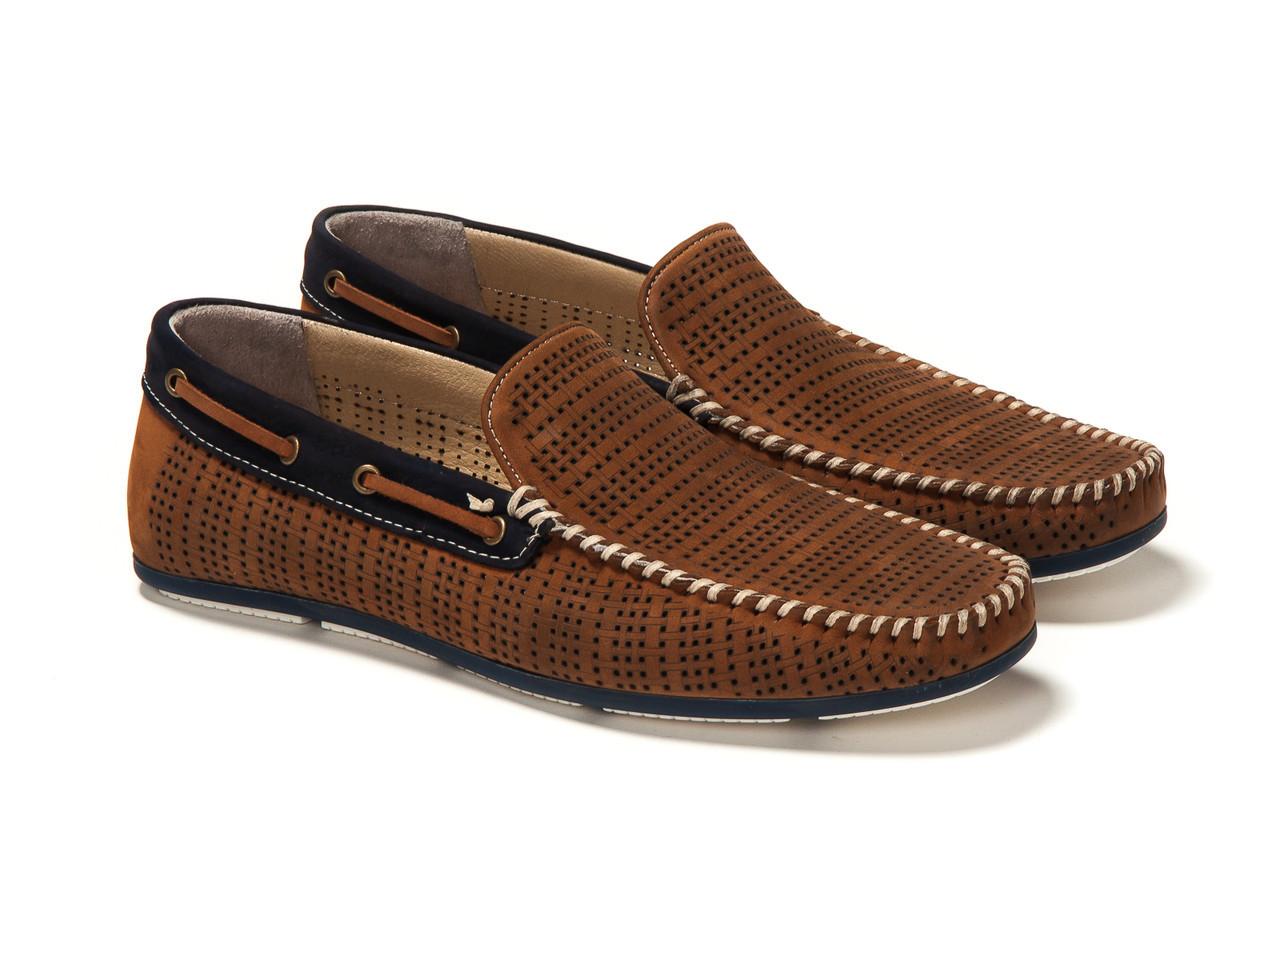 Мокасины Etor 11341-6534-9999 45 коричневые